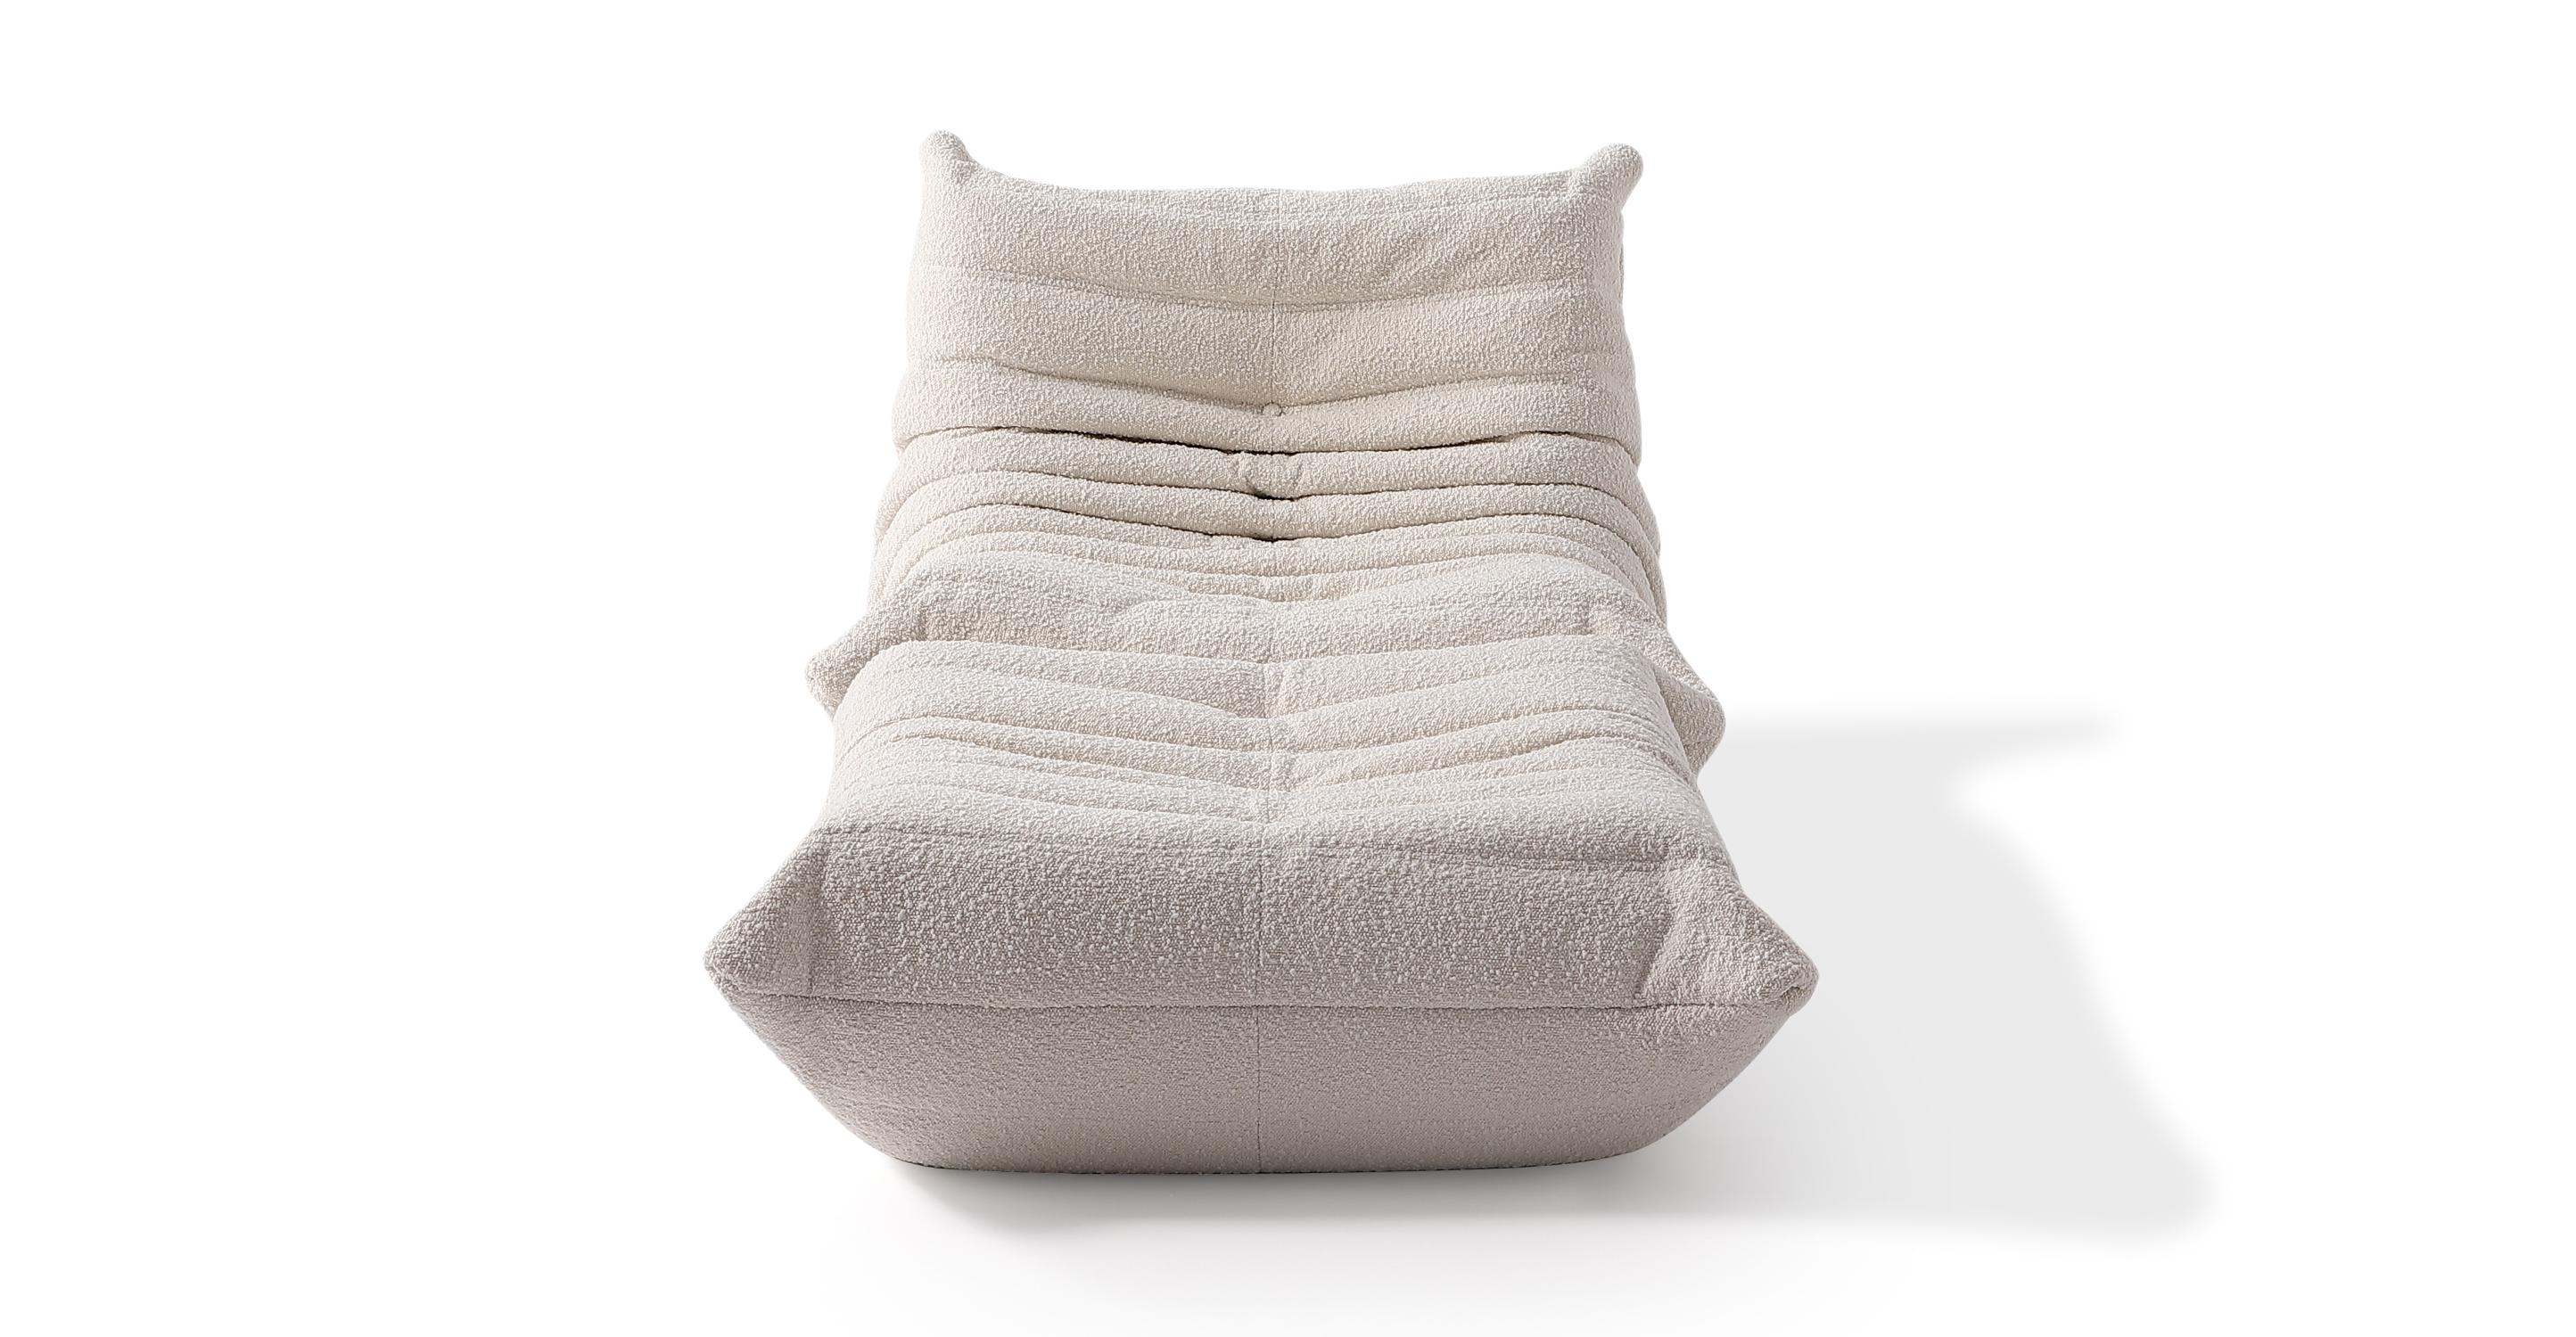 Louvre Fabric Chair & Ottoman, Blanc Boucle